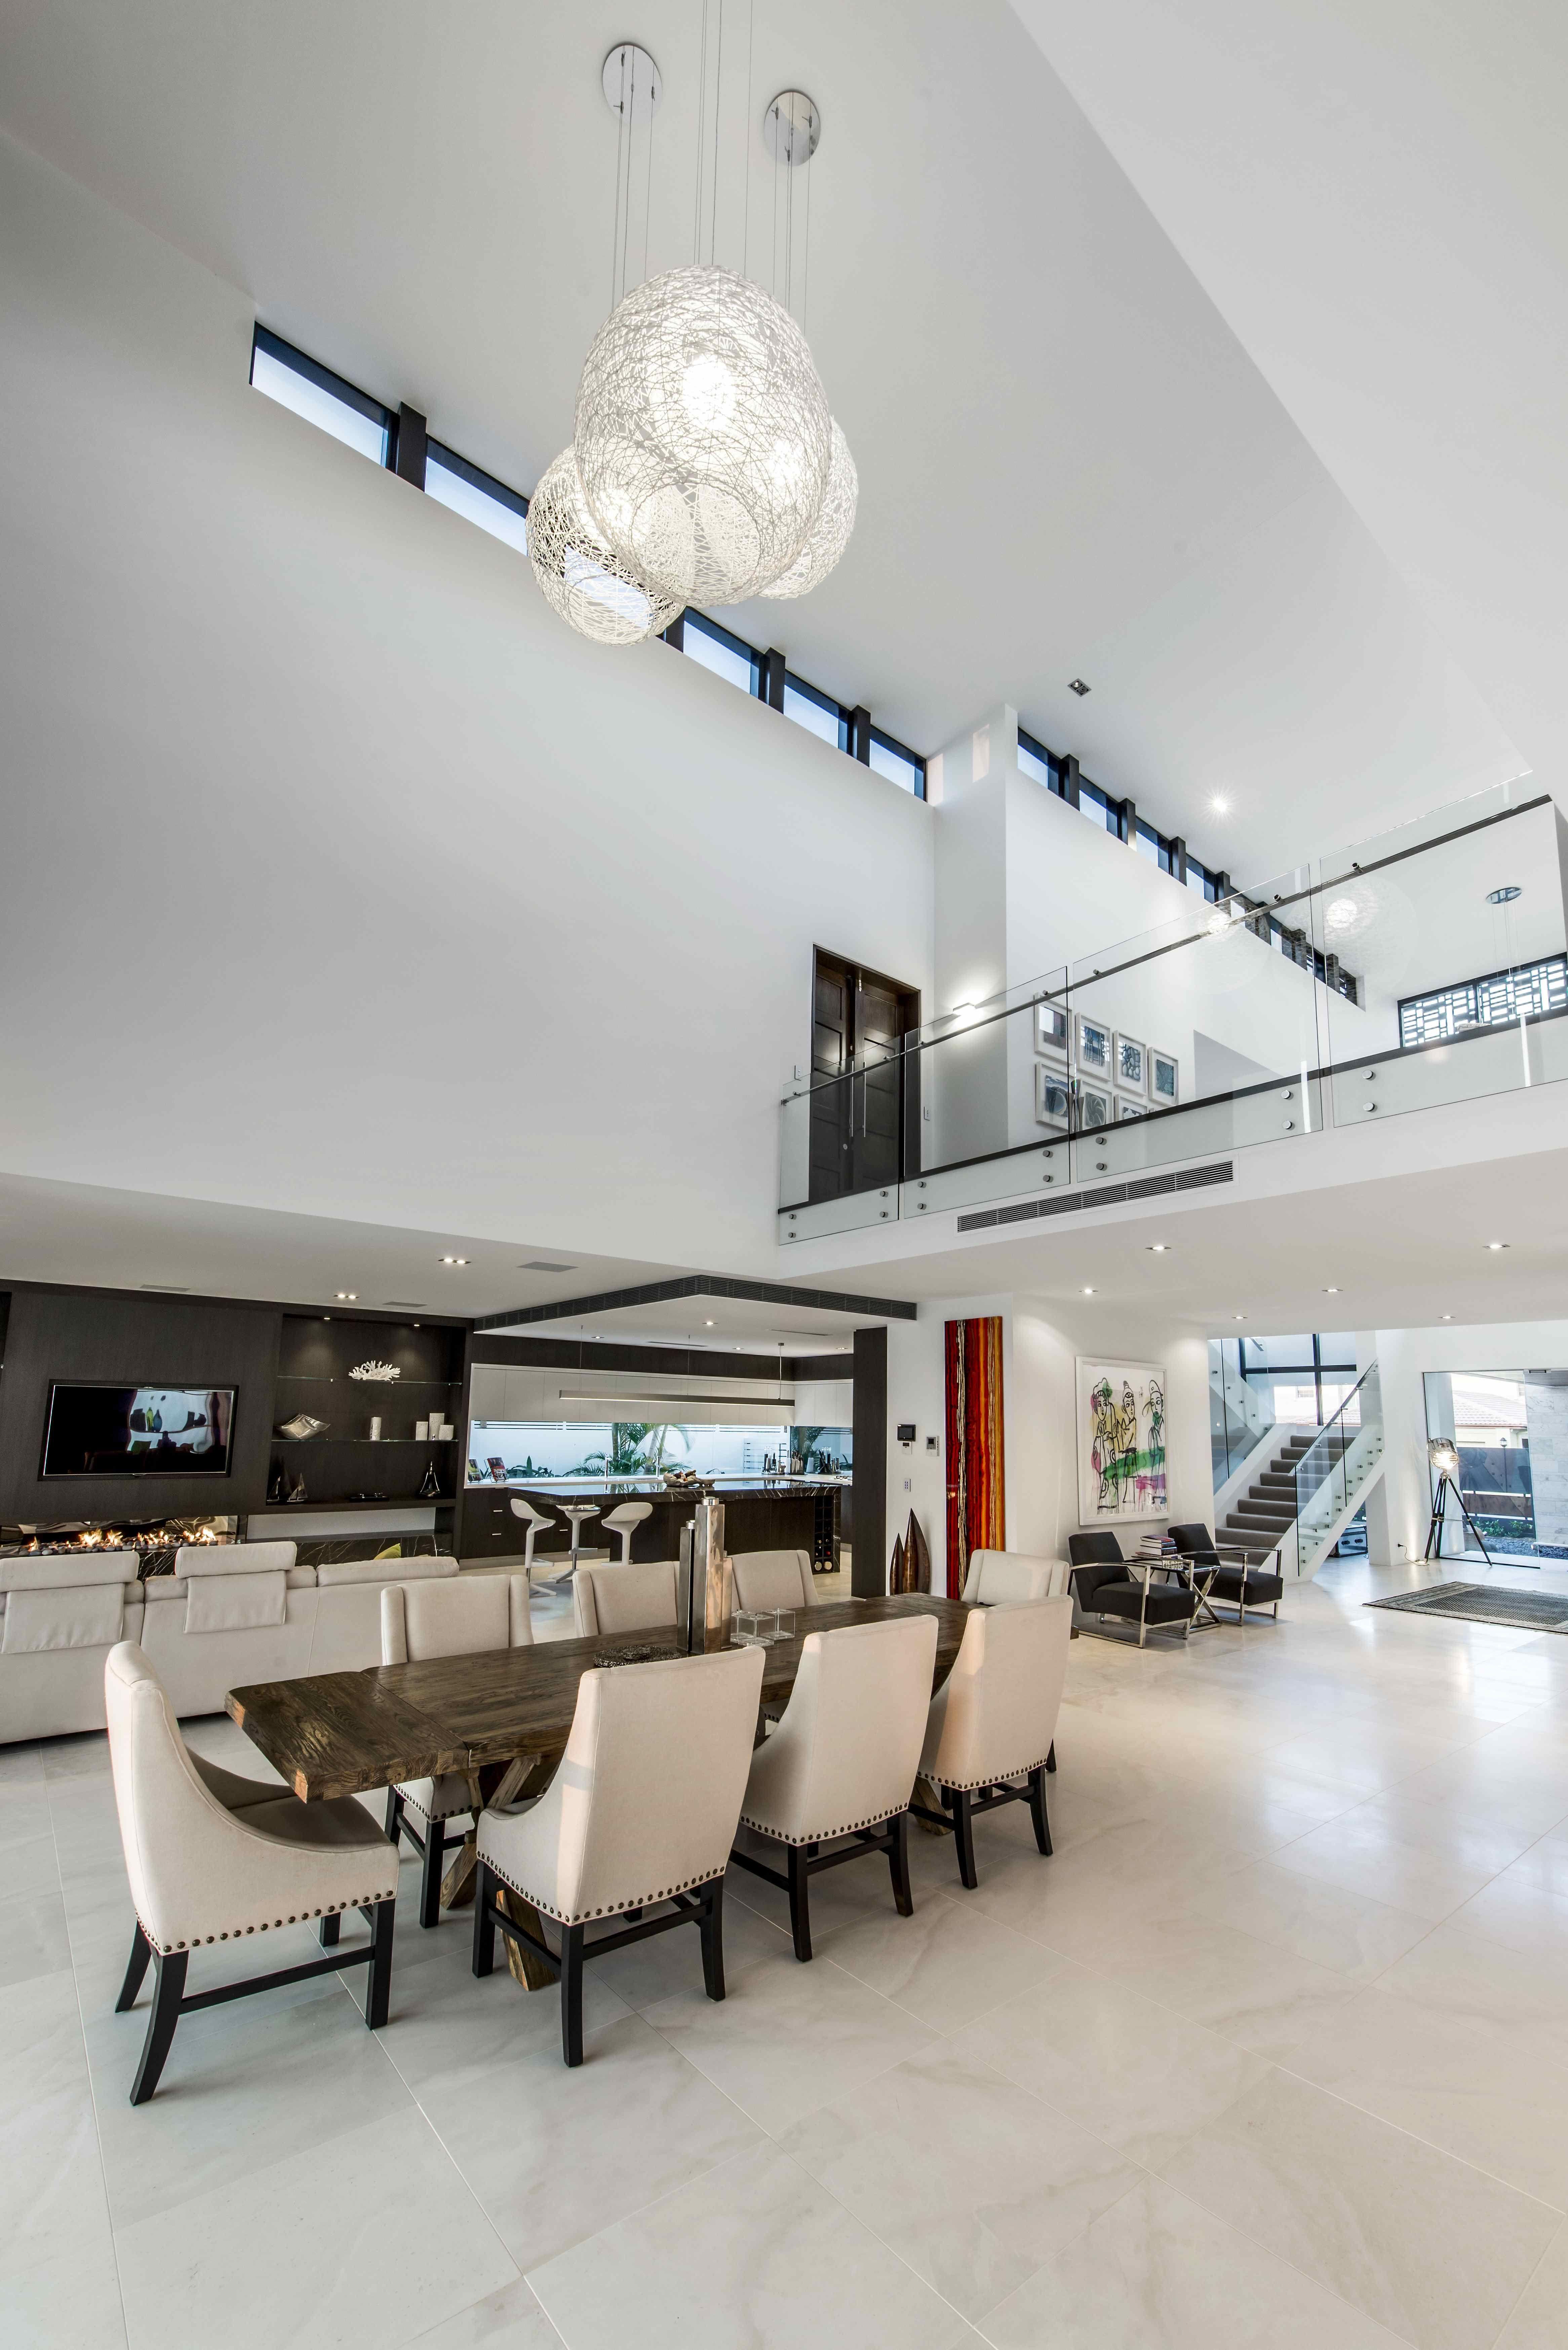 Decoraci n salones modernos modern interiors doble - Diseno salones modernos ...